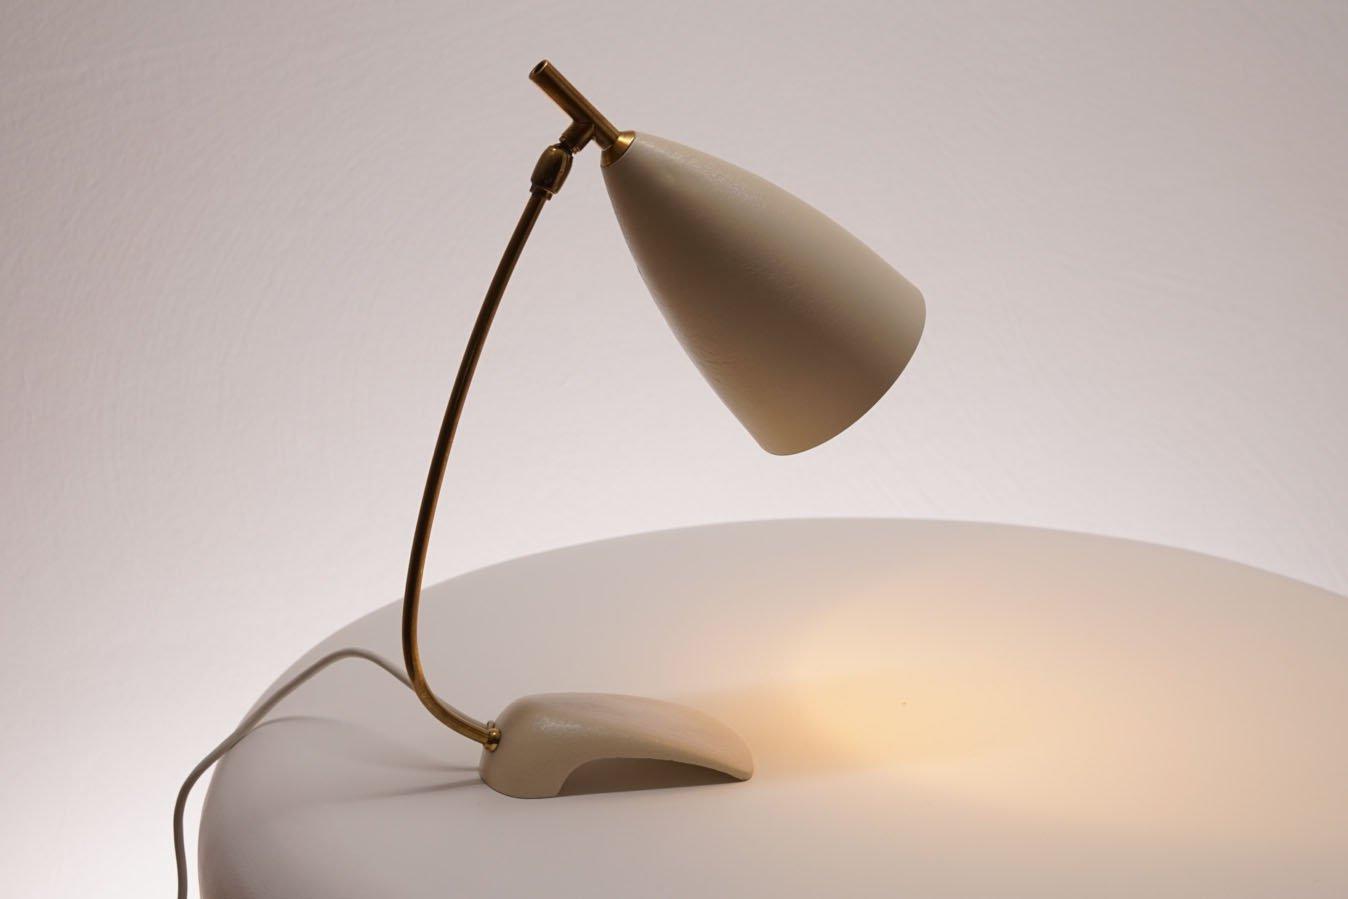 lampe de bureau mid century blanche en vente sur pamono. Black Bedroom Furniture Sets. Home Design Ideas